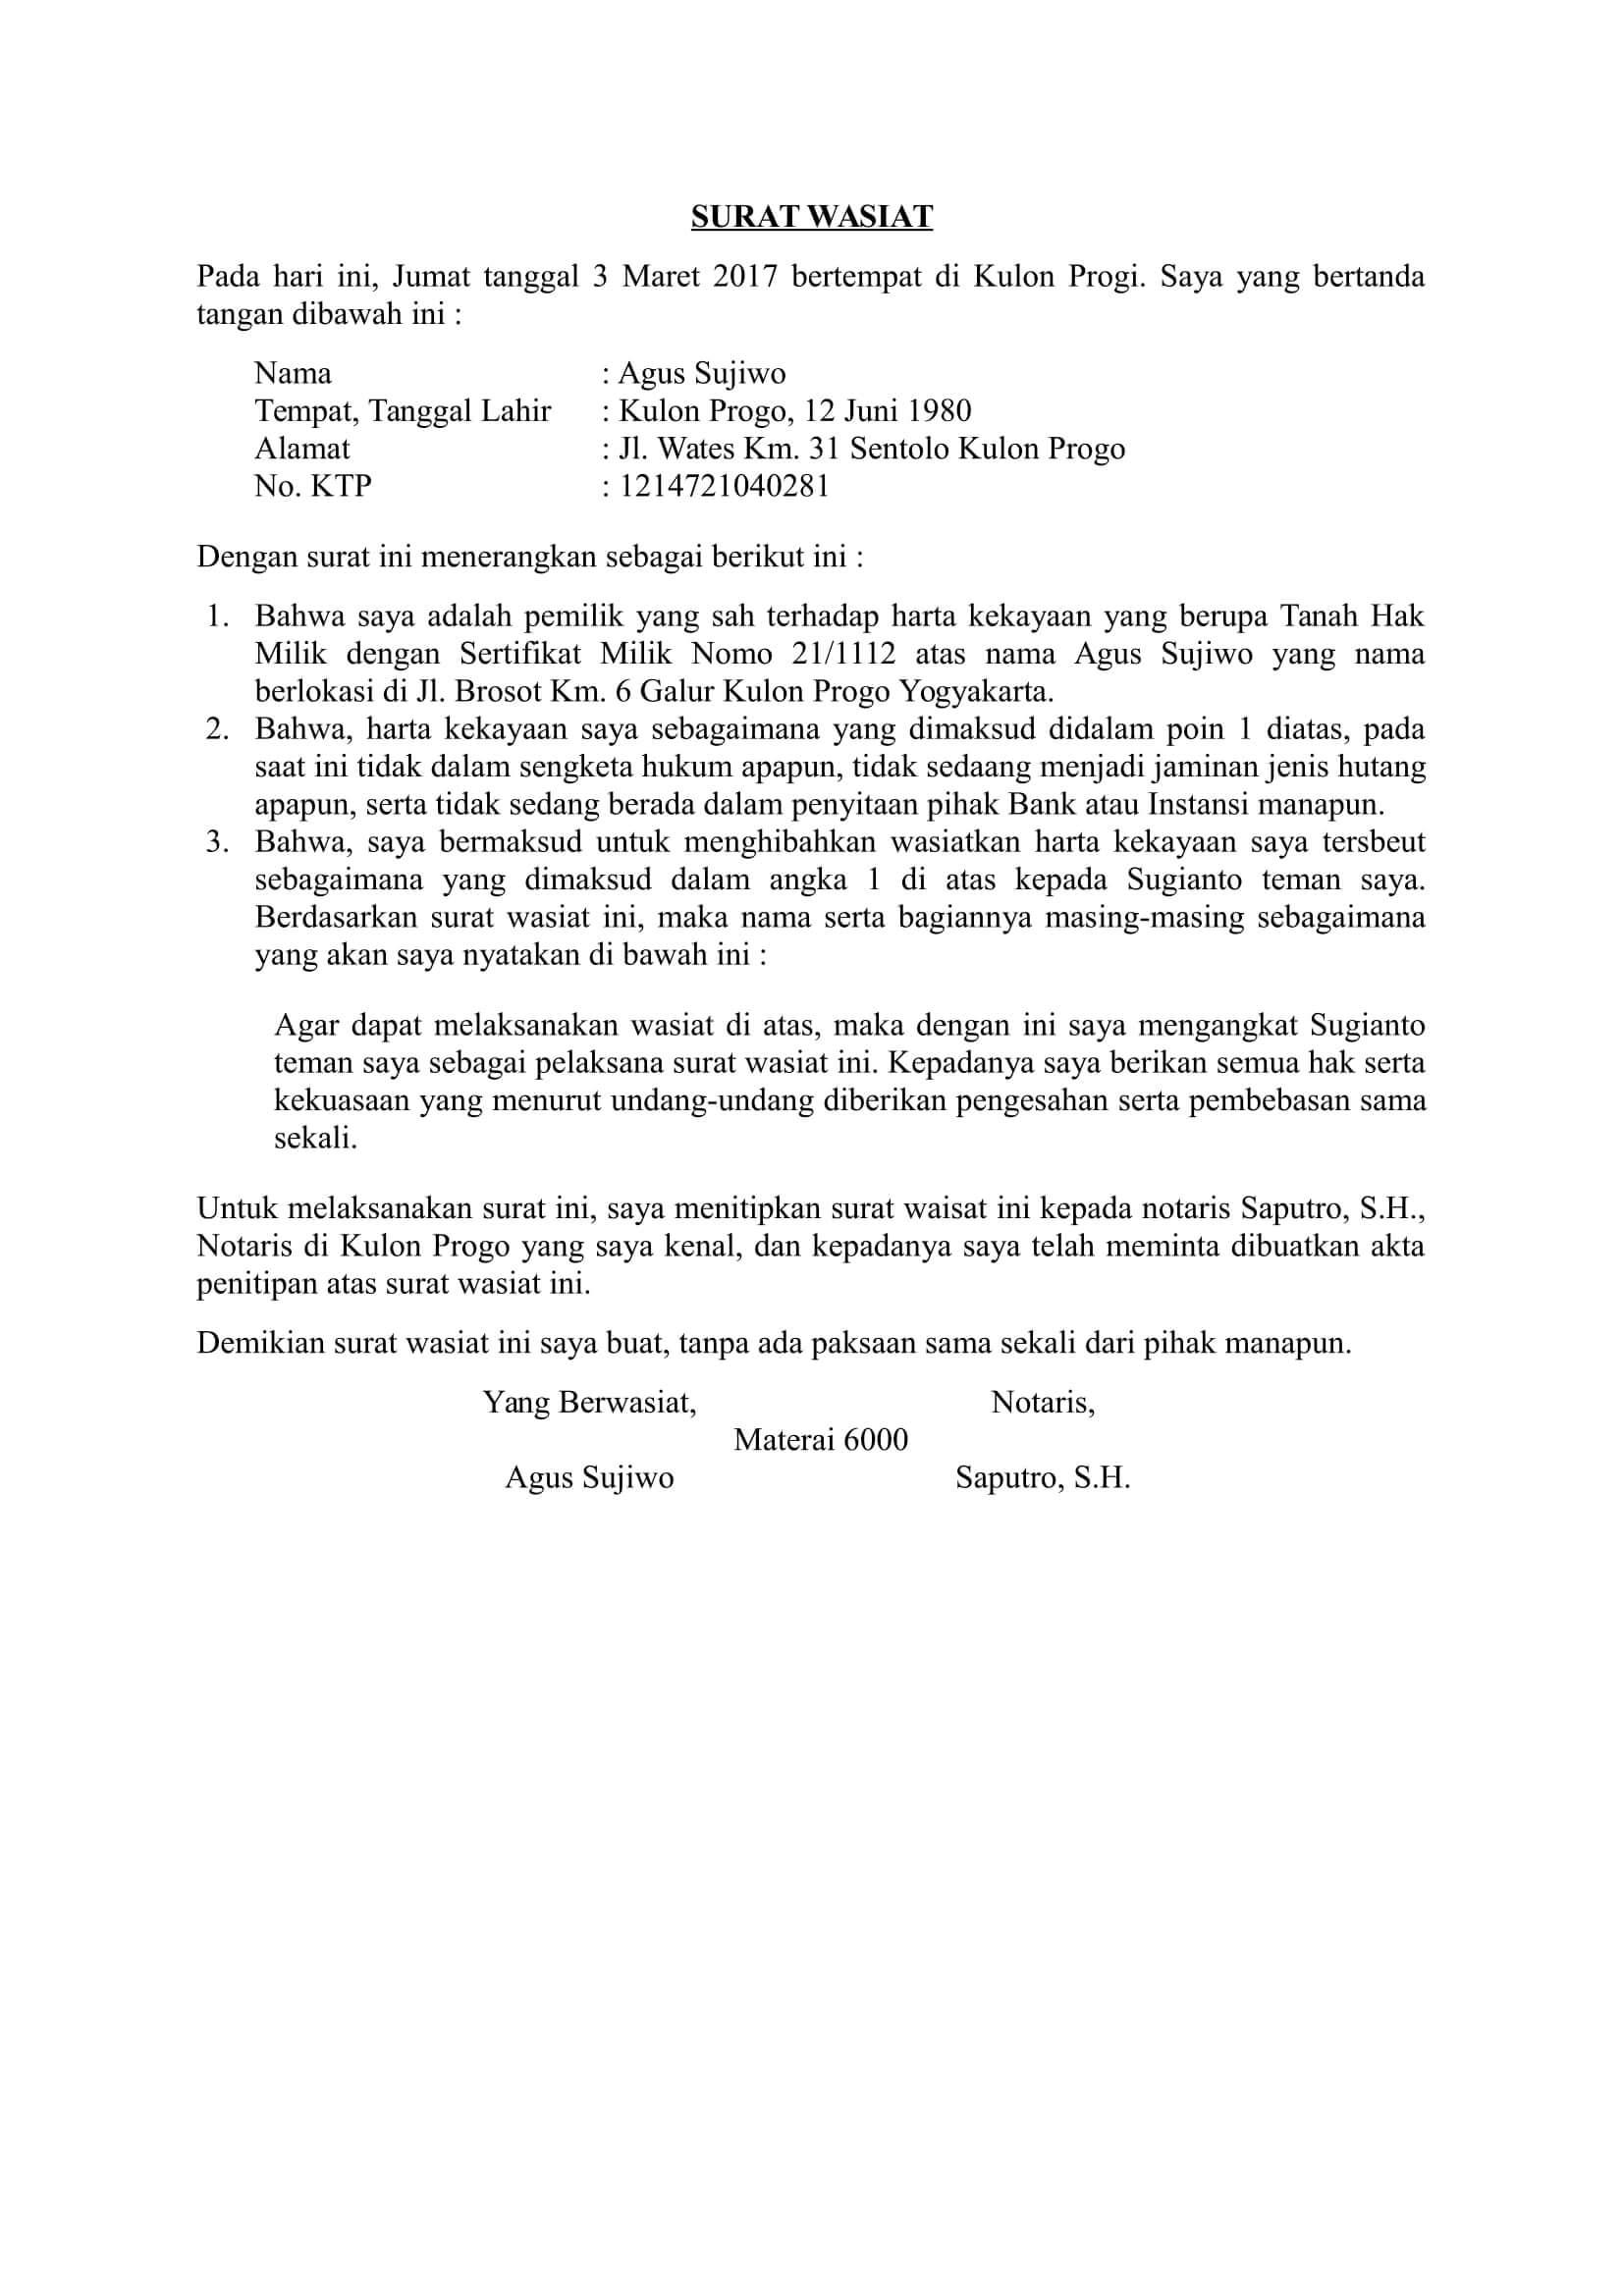 Contoh Surat Wasiat